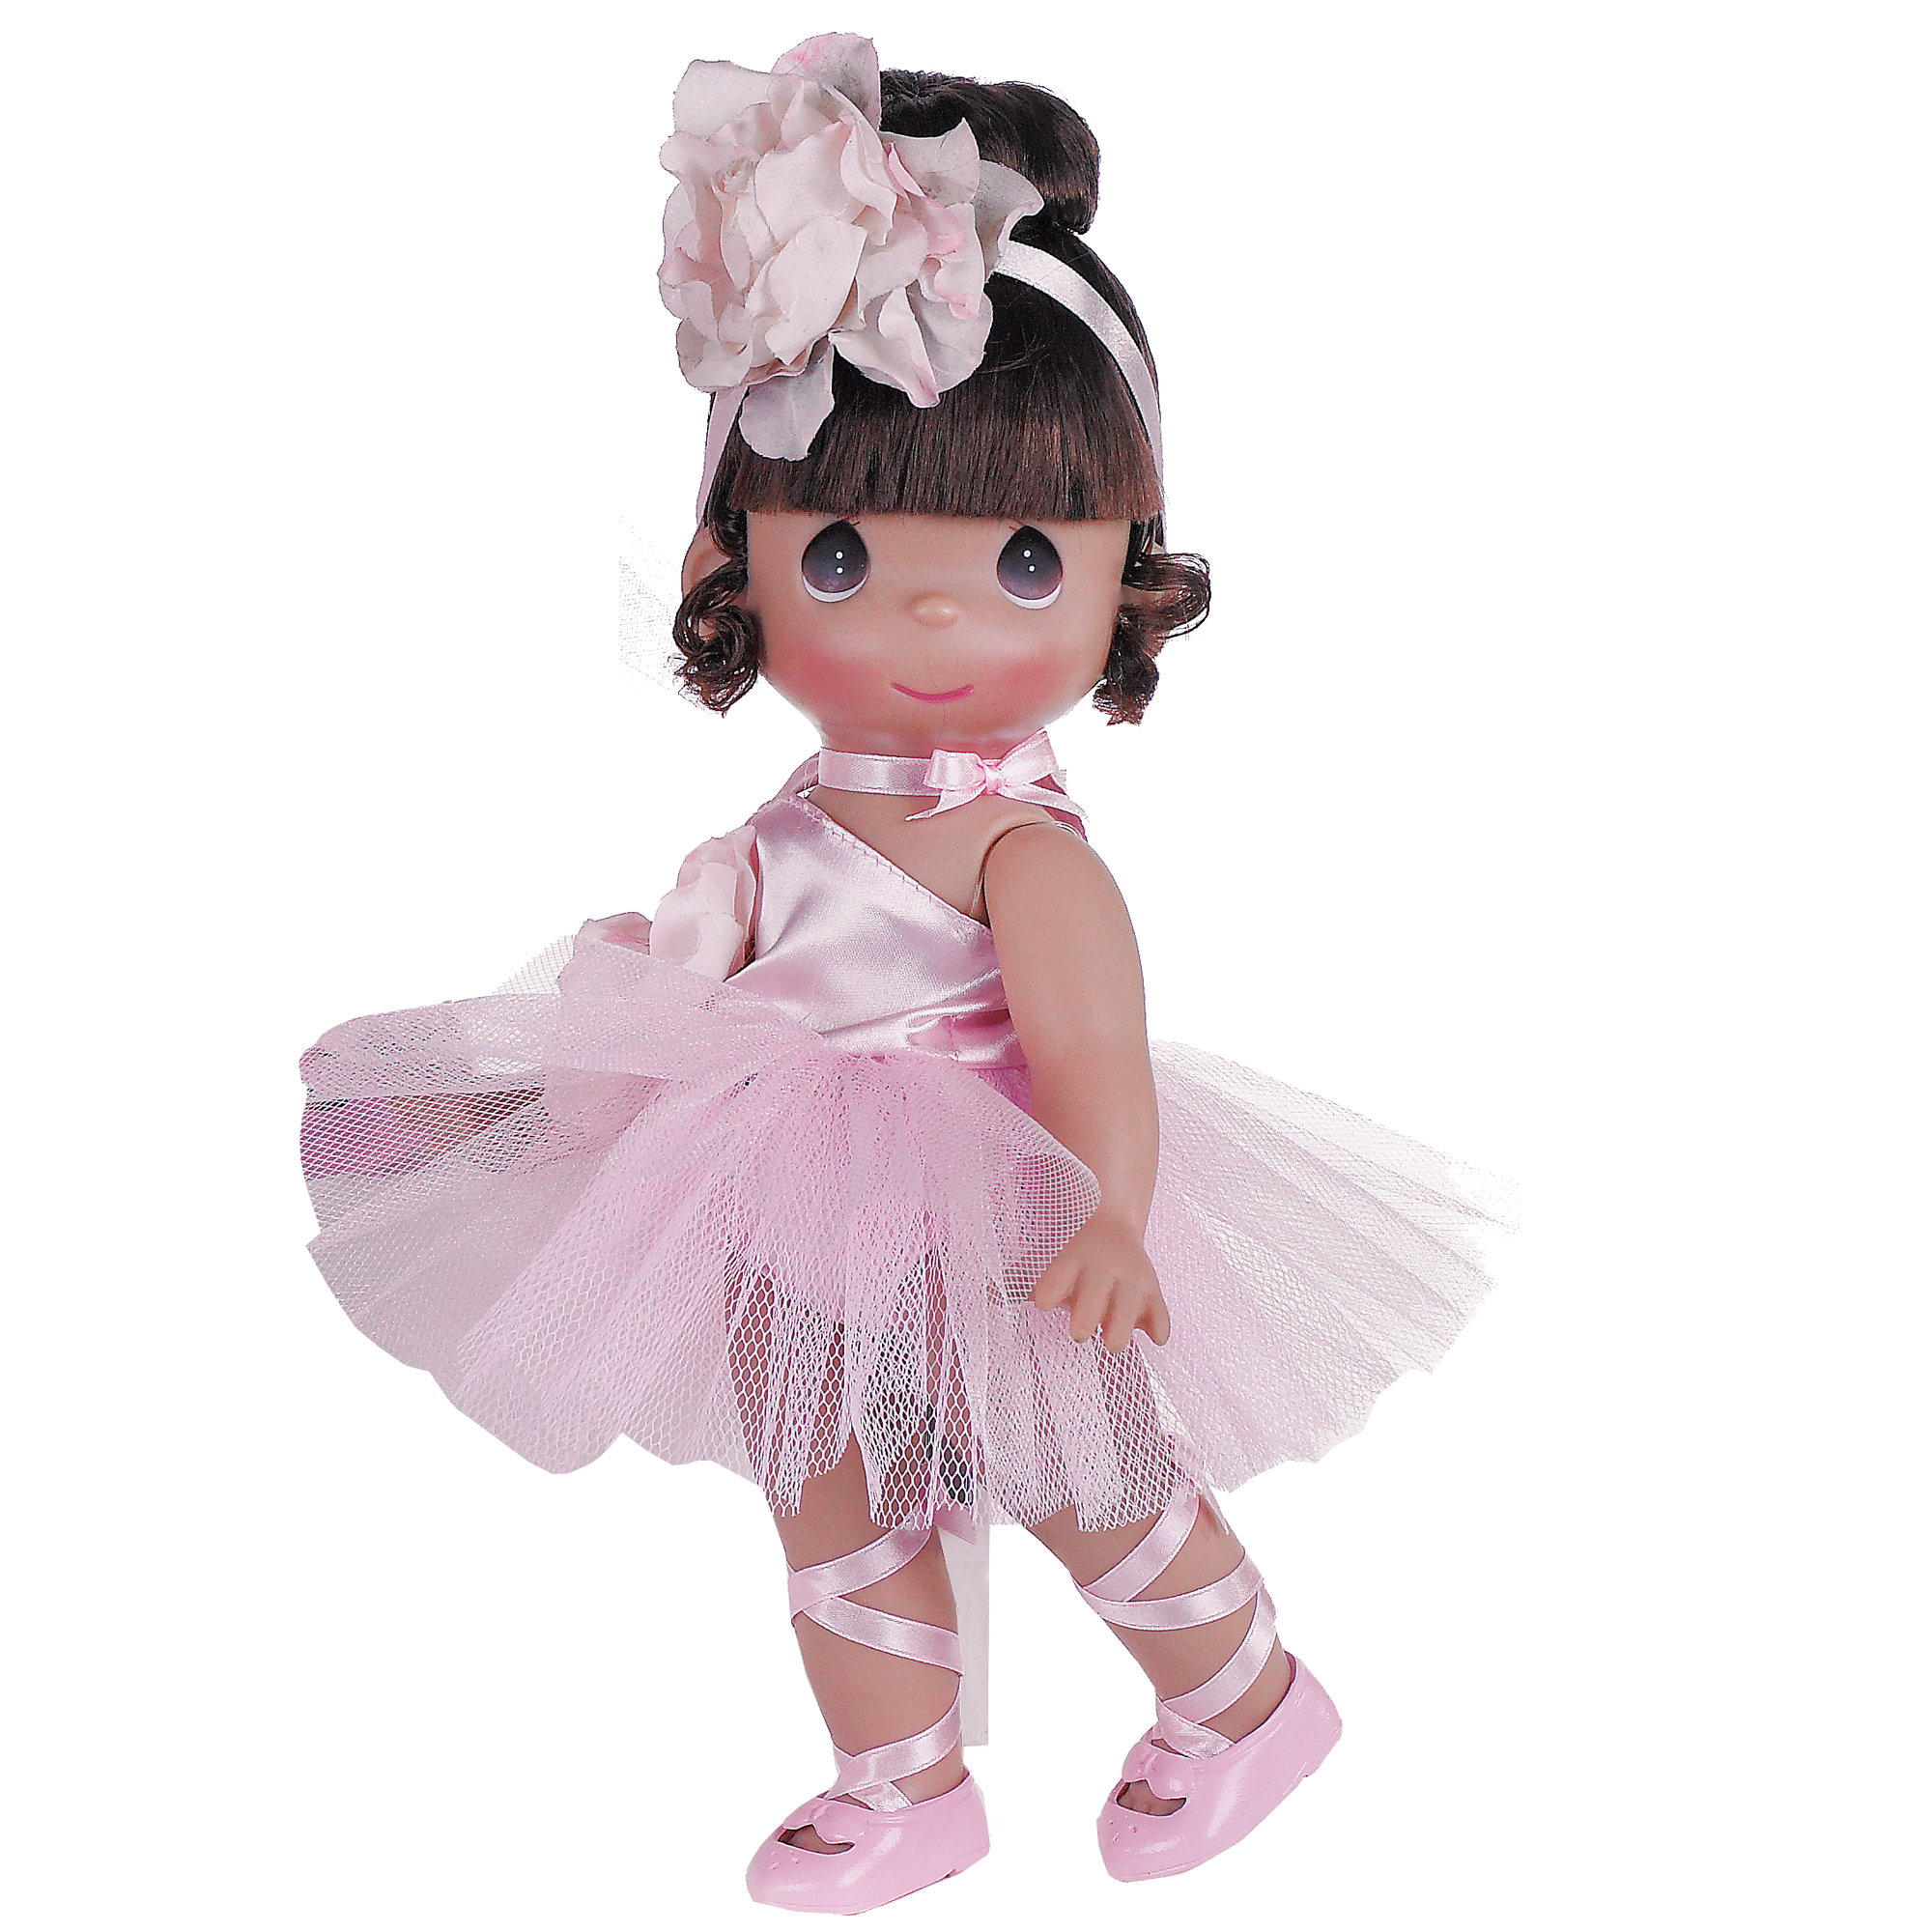 Precious Moments Dolls by The Doll Maker, Linda Rick, Ballerina Bliss Brunette, 12 inch doll